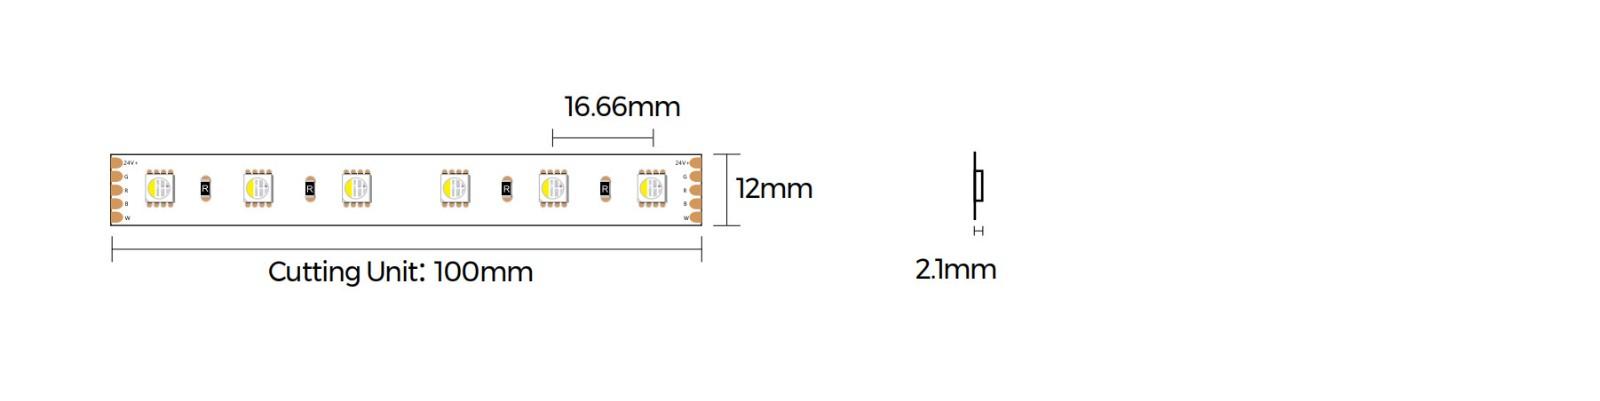 D560RGBW-24V-12mm